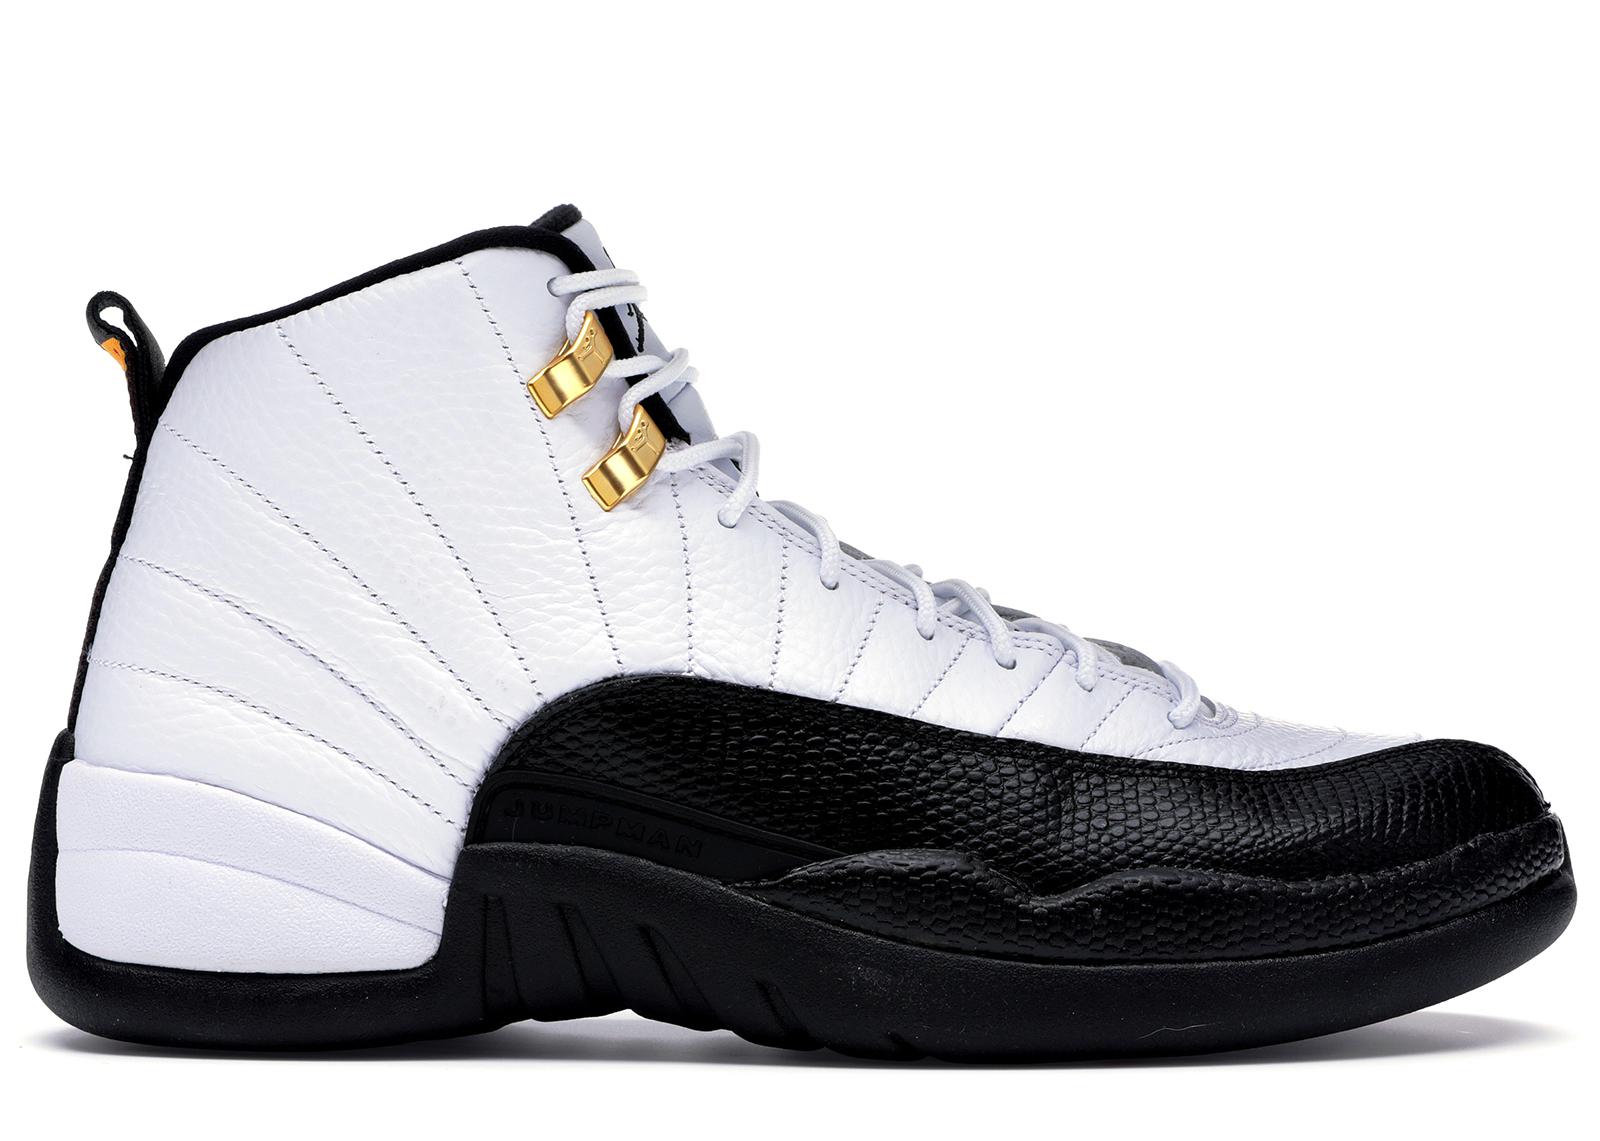 Air Jordan 12 Size 14 Shoes - Total Sold